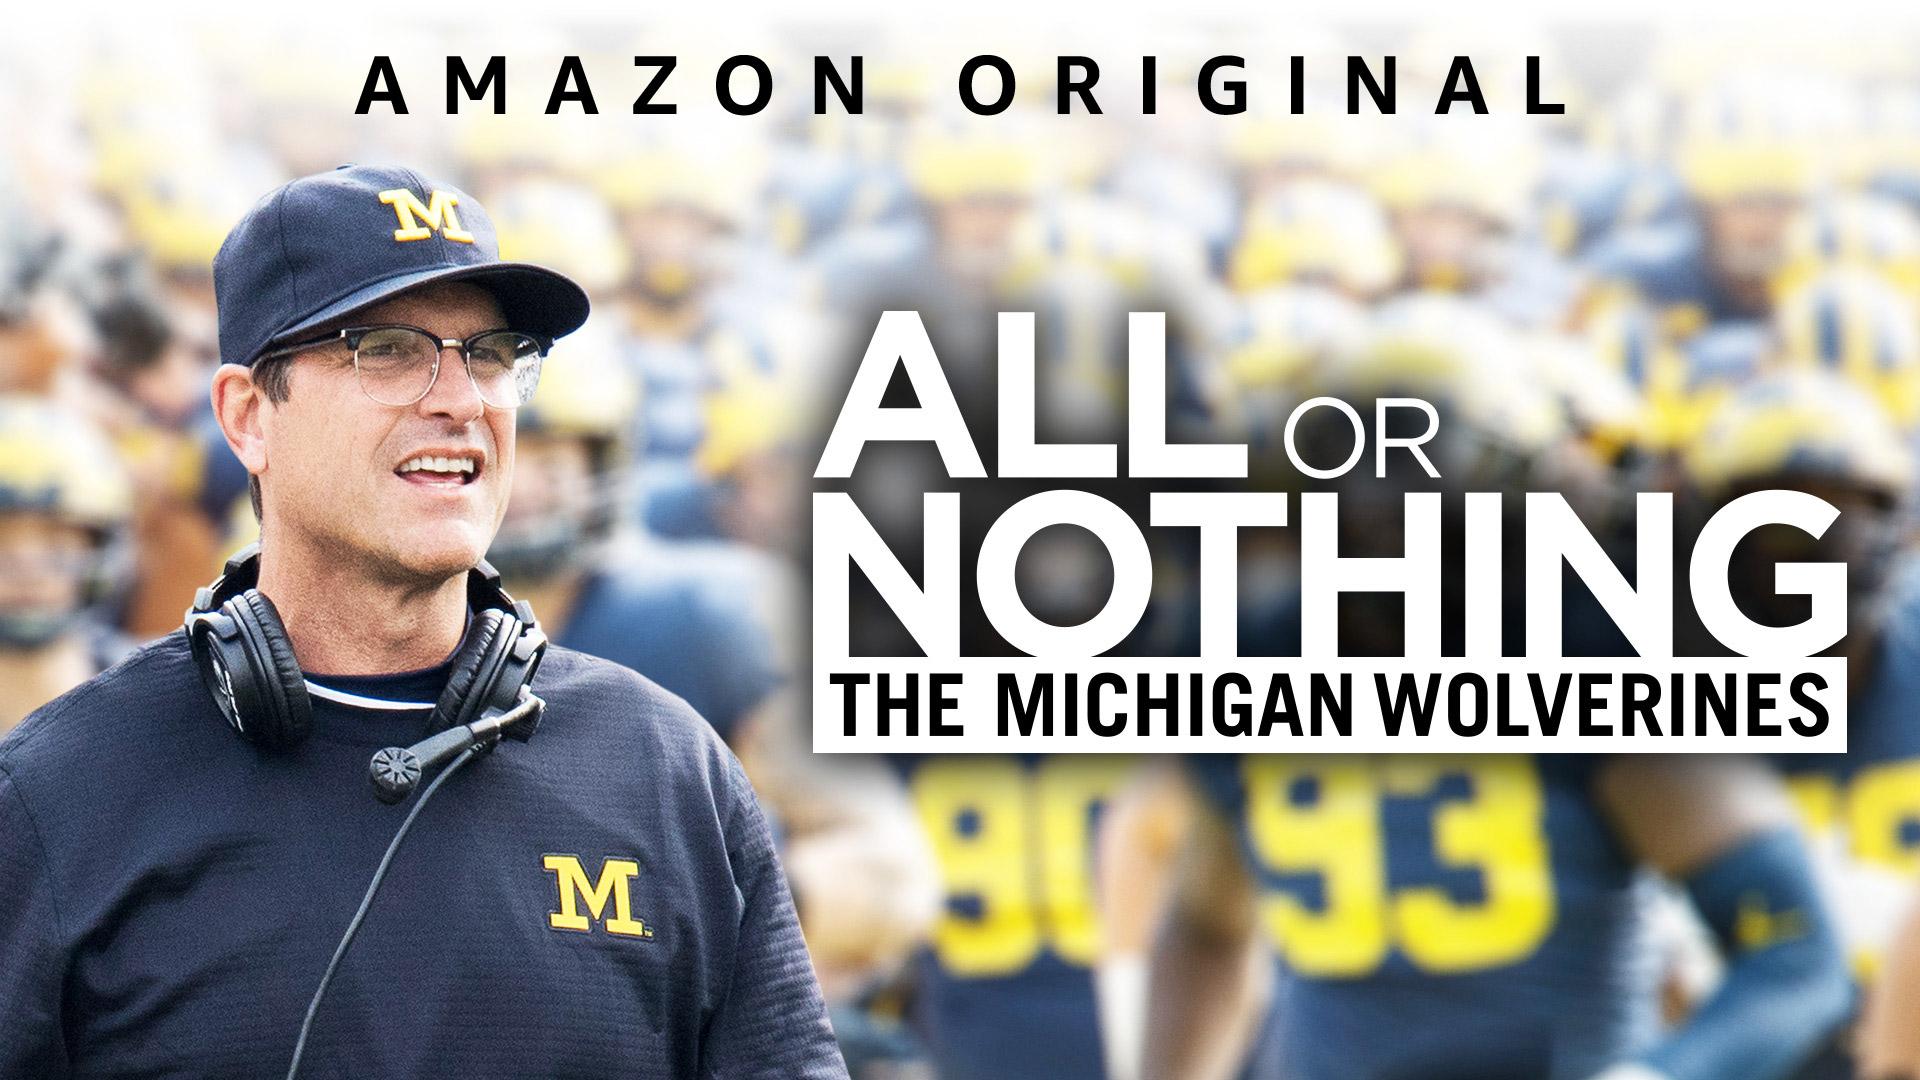 Wszystko albo nic: The Michigan Wolverines - Sezon 1